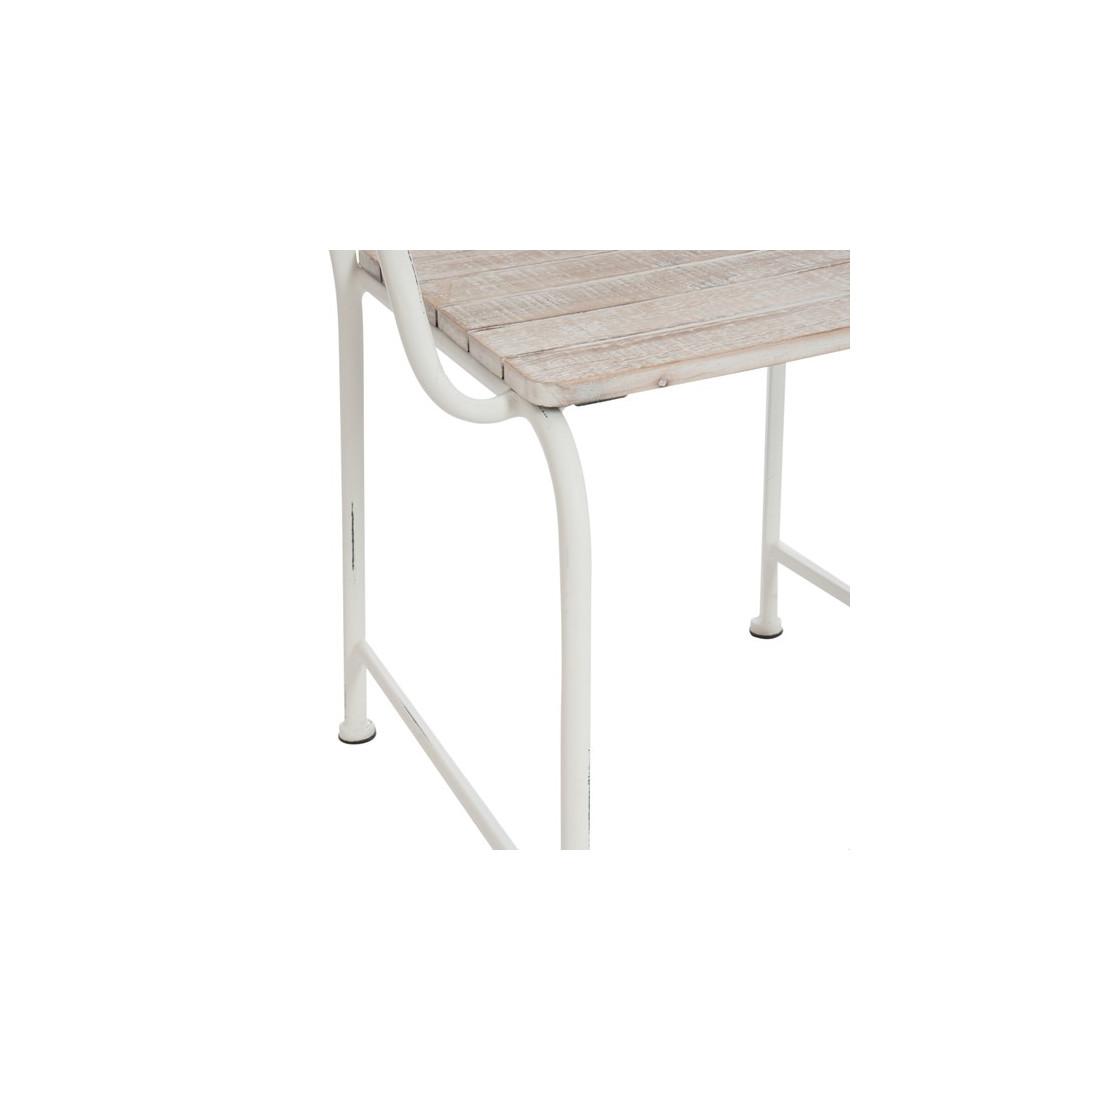 chaise bois blanchi bord de mer roxane univers salle. Black Bedroom Furniture Sets. Home Design Ideas